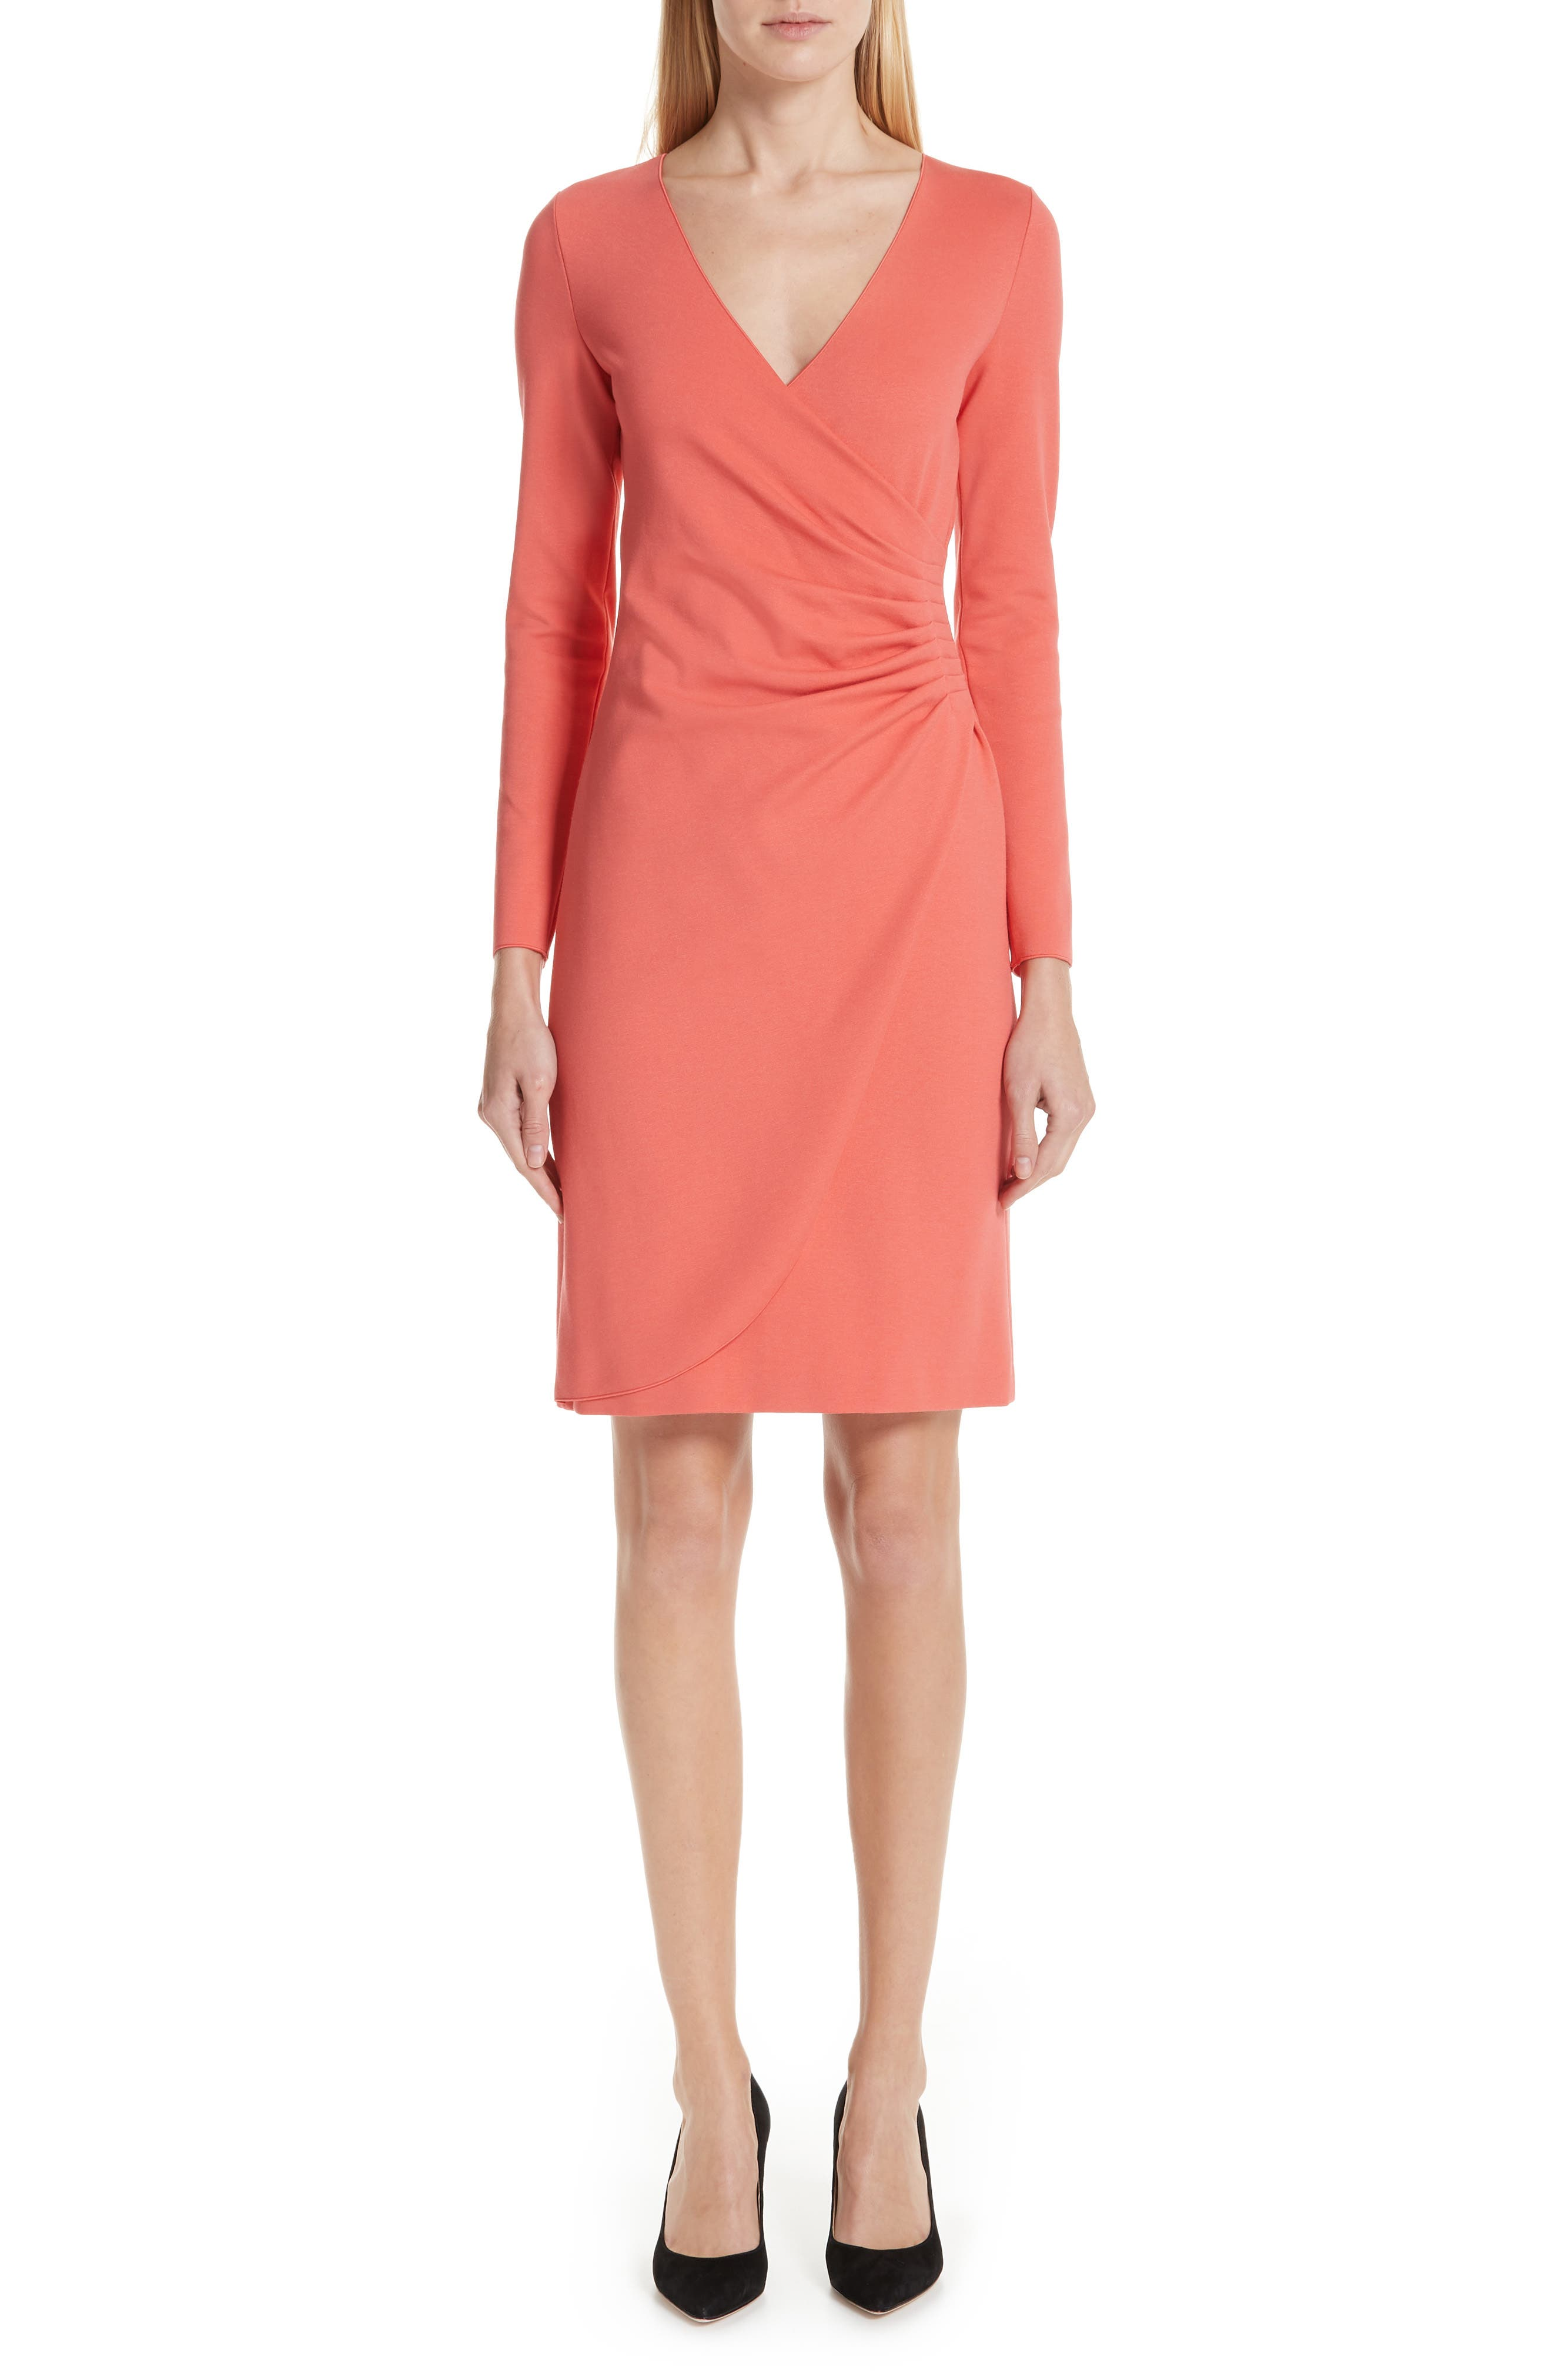 Emporio Armani Punto Milano Faux Wrap Dress, 8 IT - Red